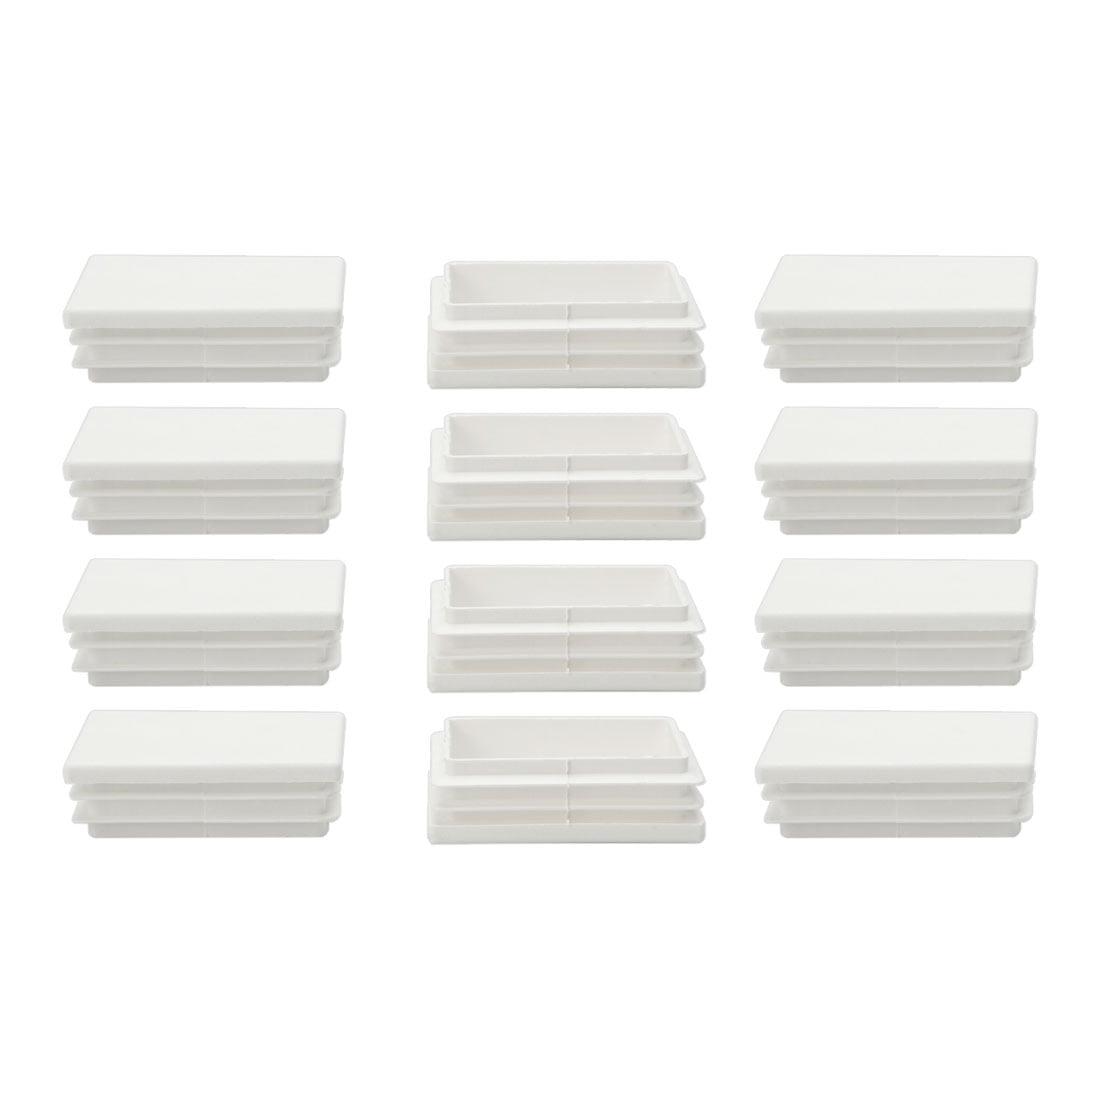 12pcs 40 x 60mm Plastic Rectangle Ribbed Tube Inserts End Cover Cap Table Feet - image 7 de 7